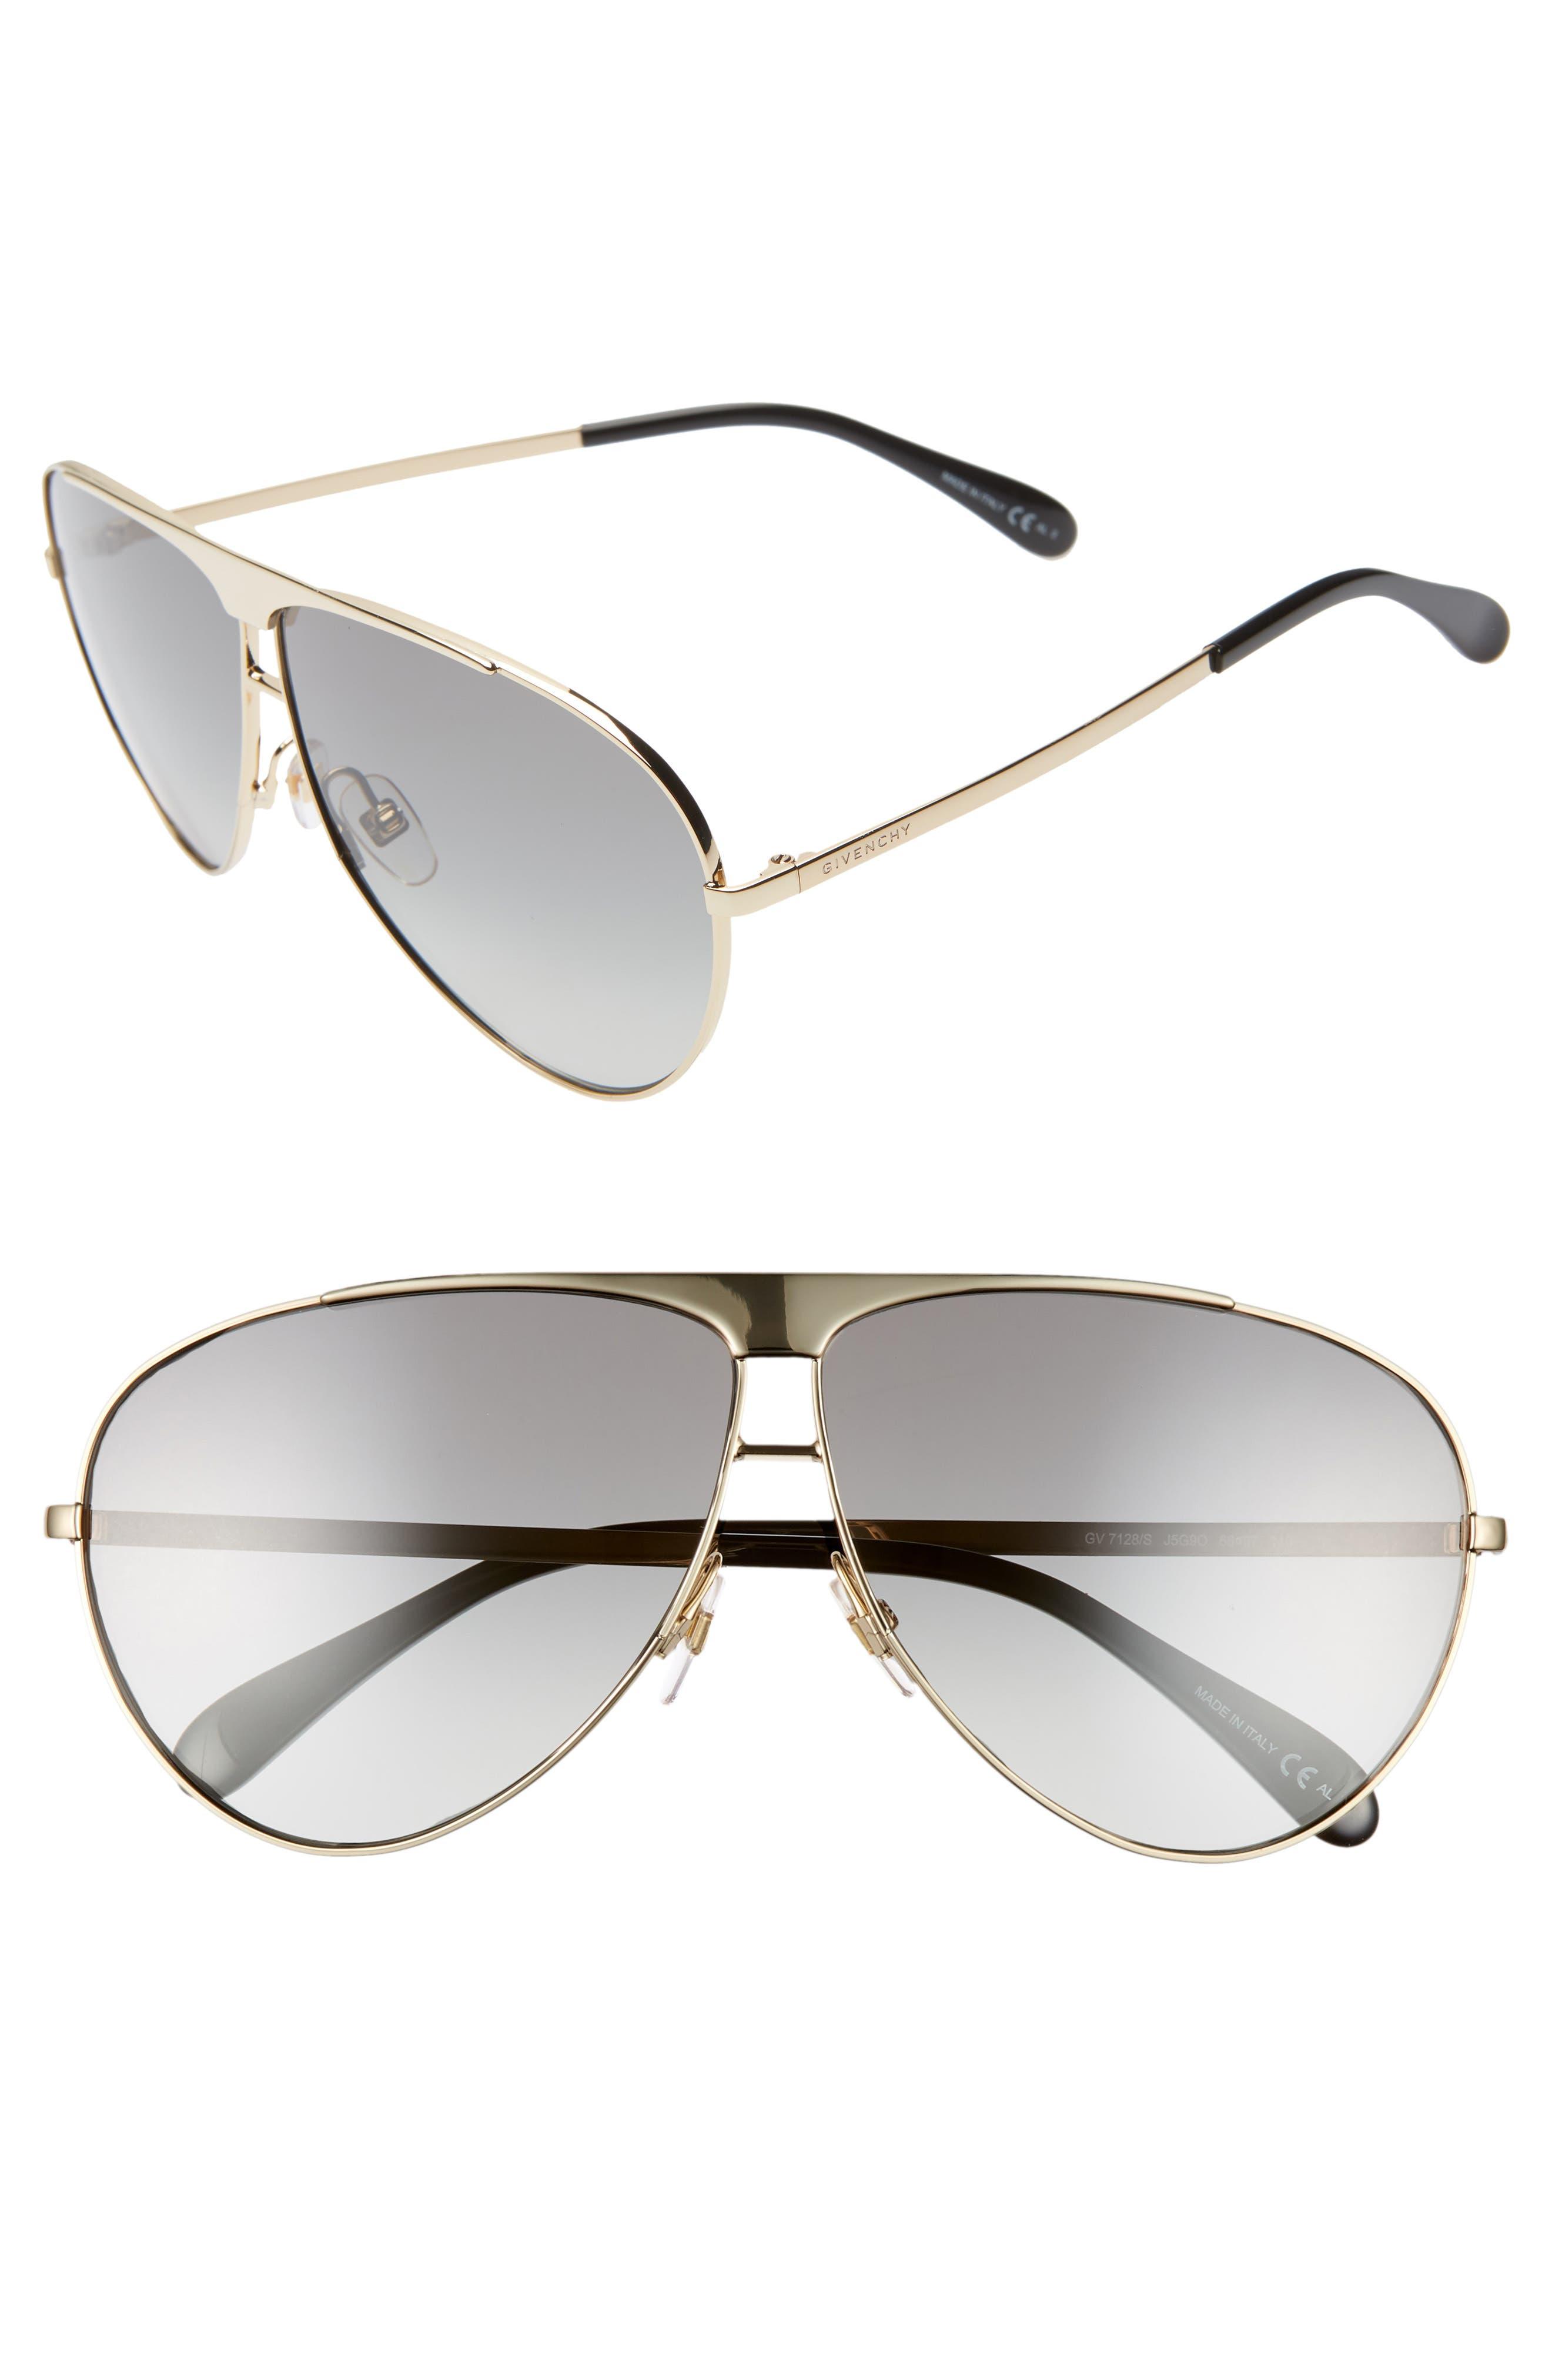 66mm Aviator Sunglasses, Main, color, 710